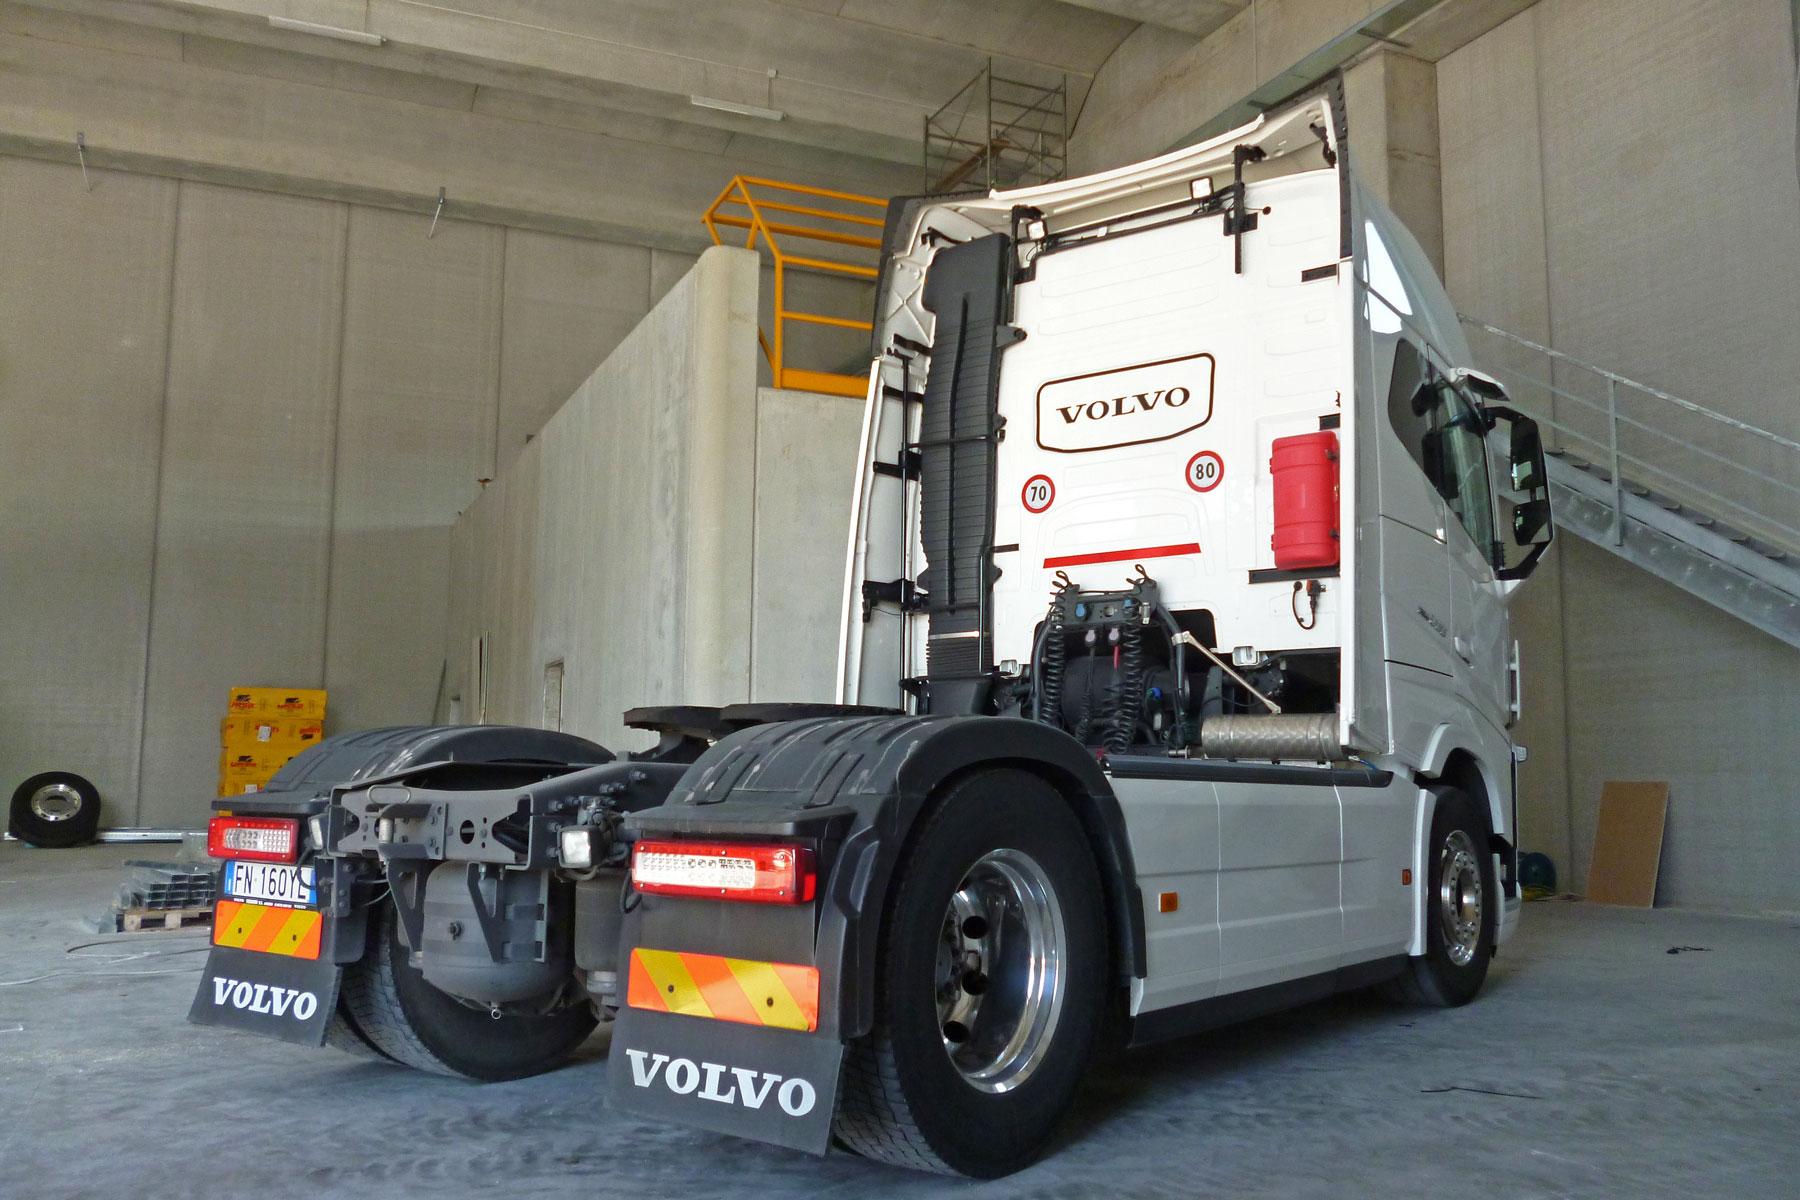 Camion Volvo D.L.G. s.r.l.